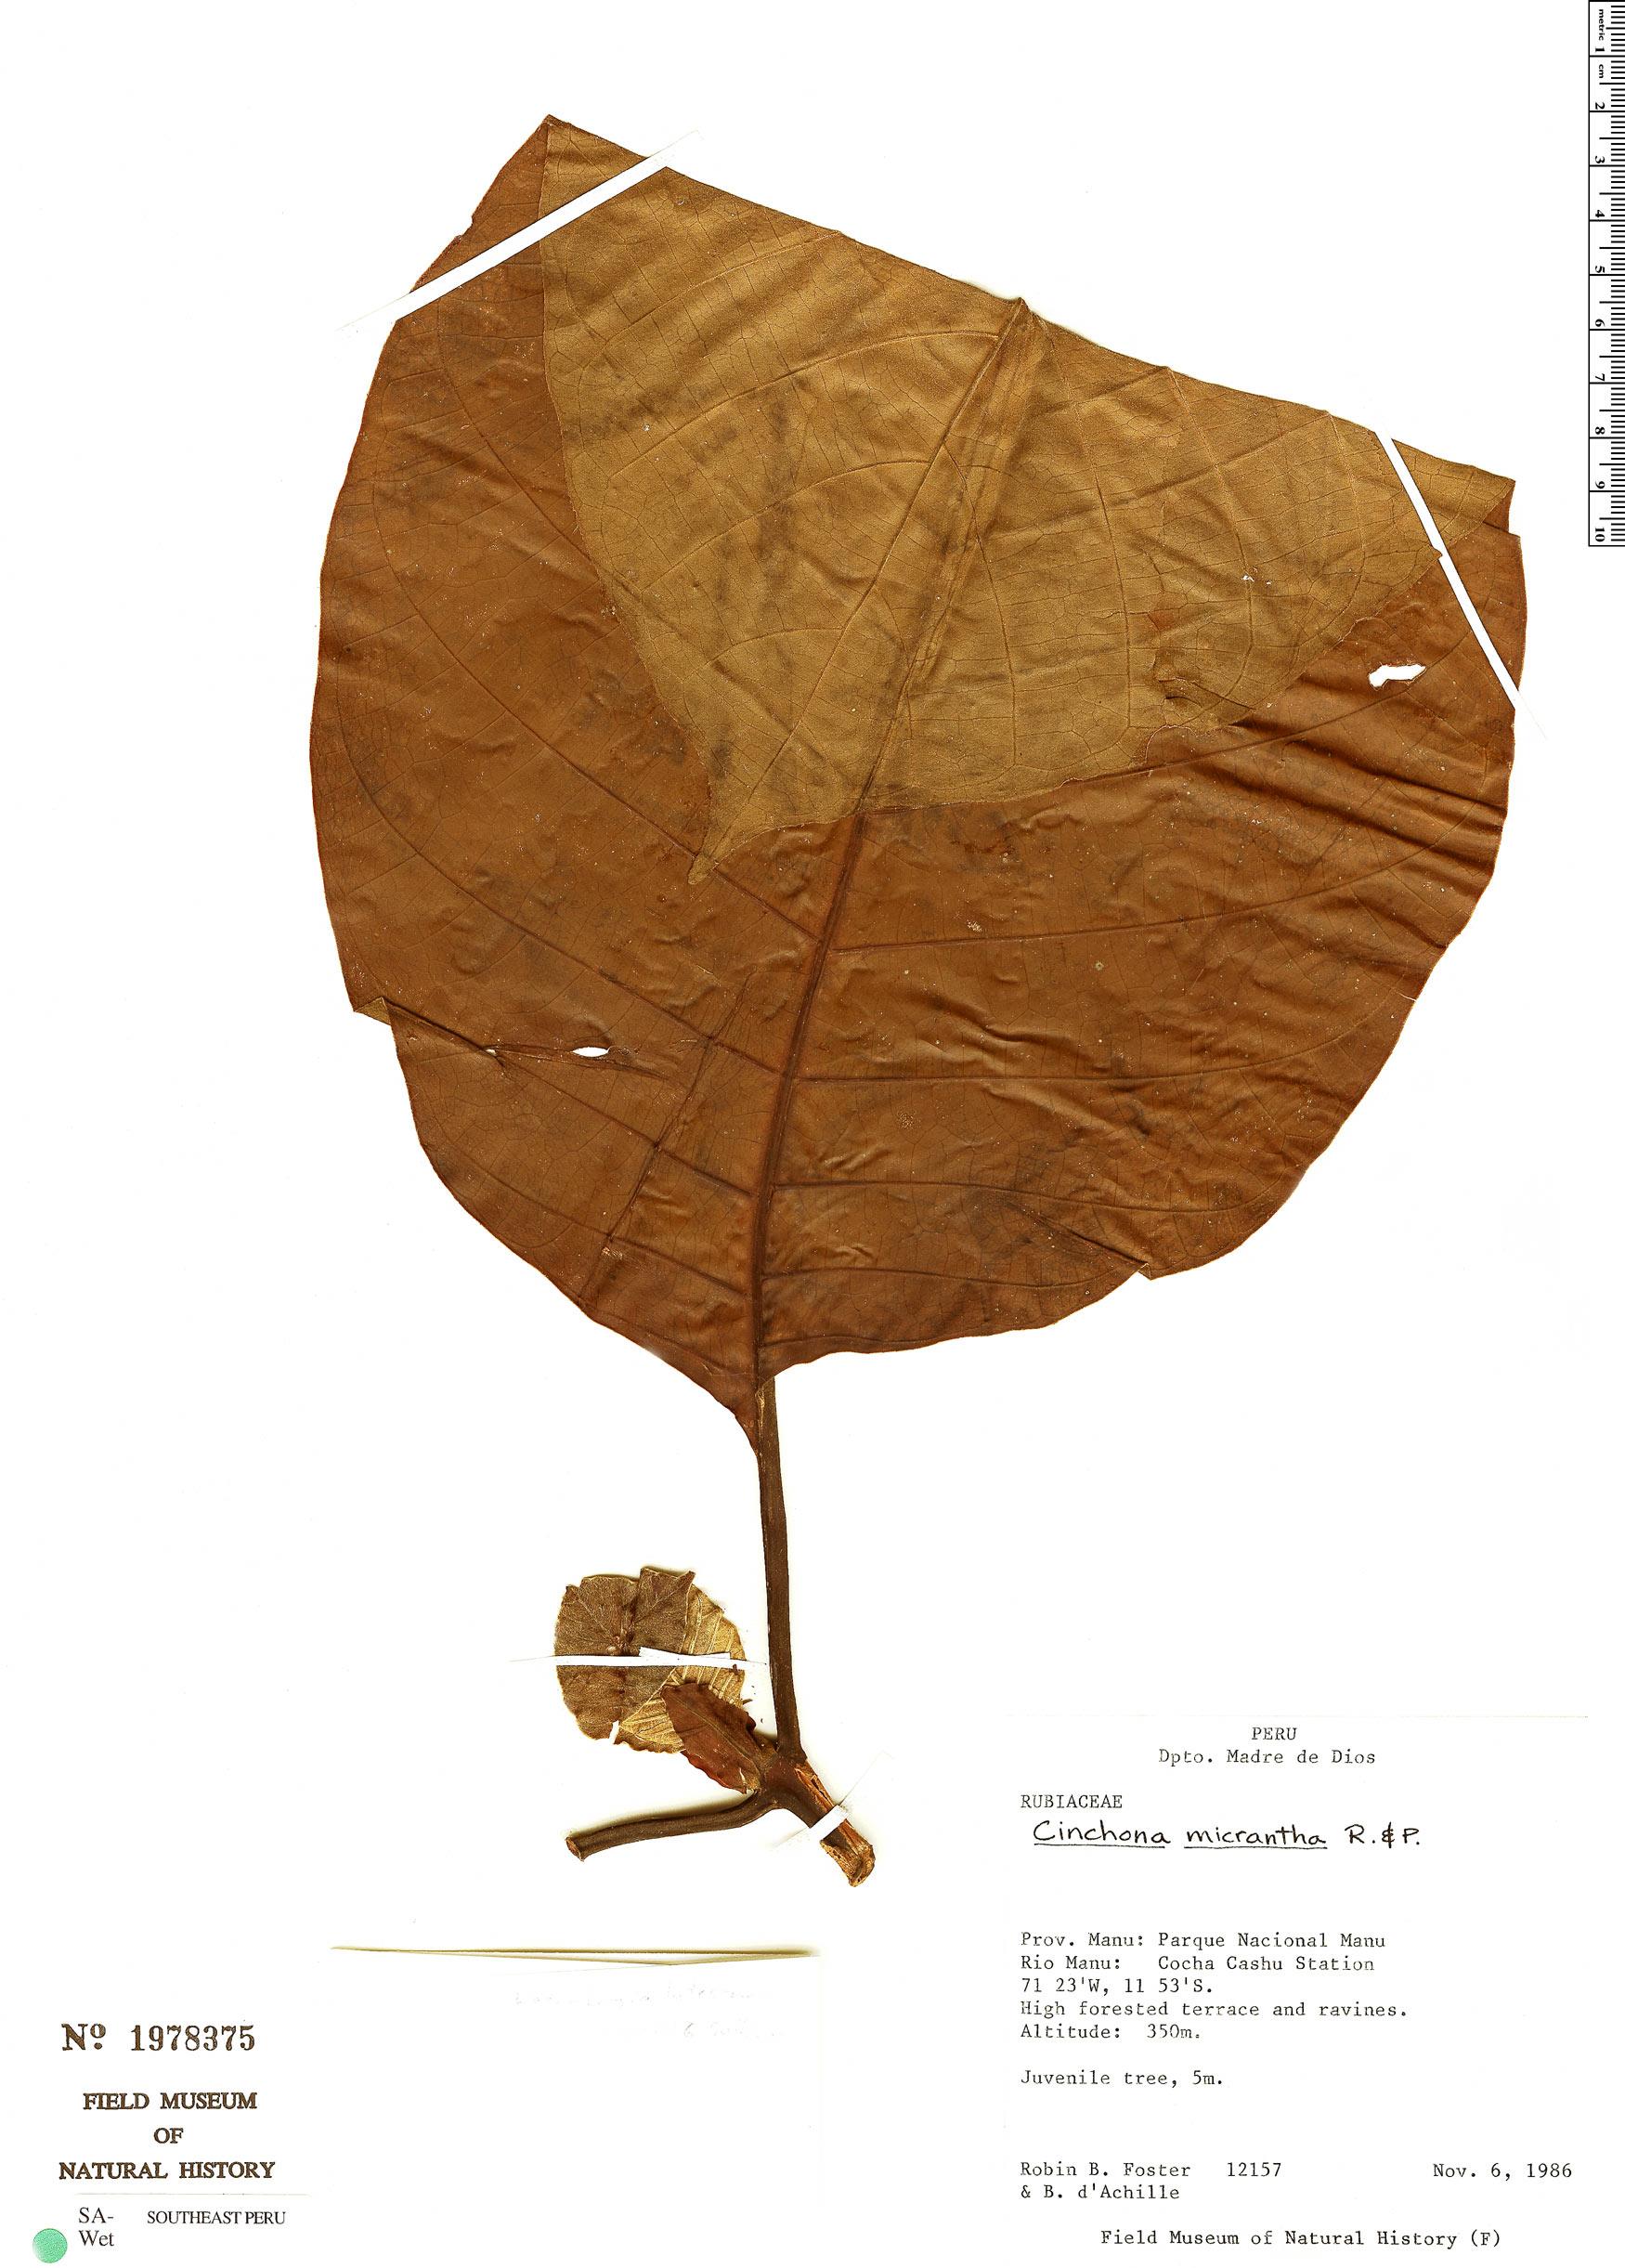 Specimen: Cinchona micrantha